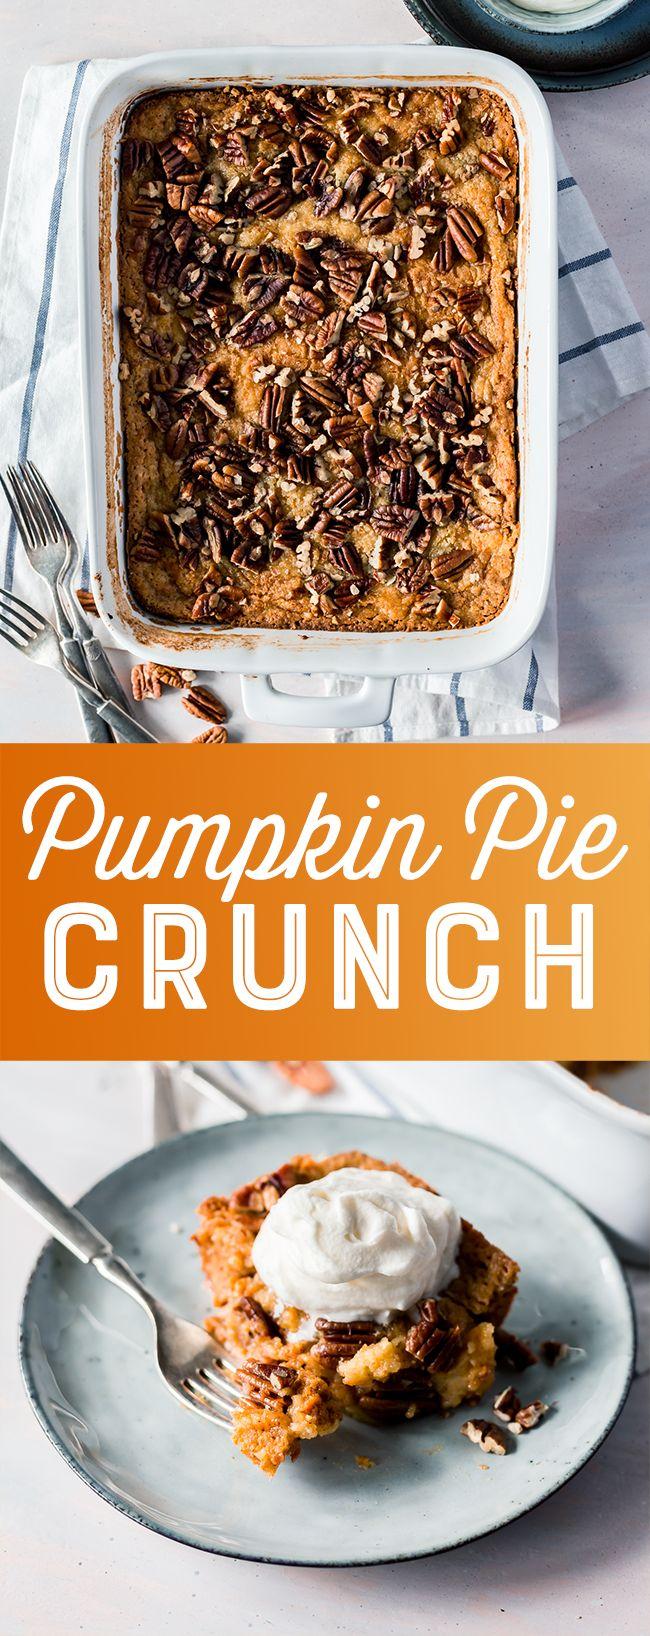 Pumpkin Pie Crunch Recipe - This simple pumpkin du…